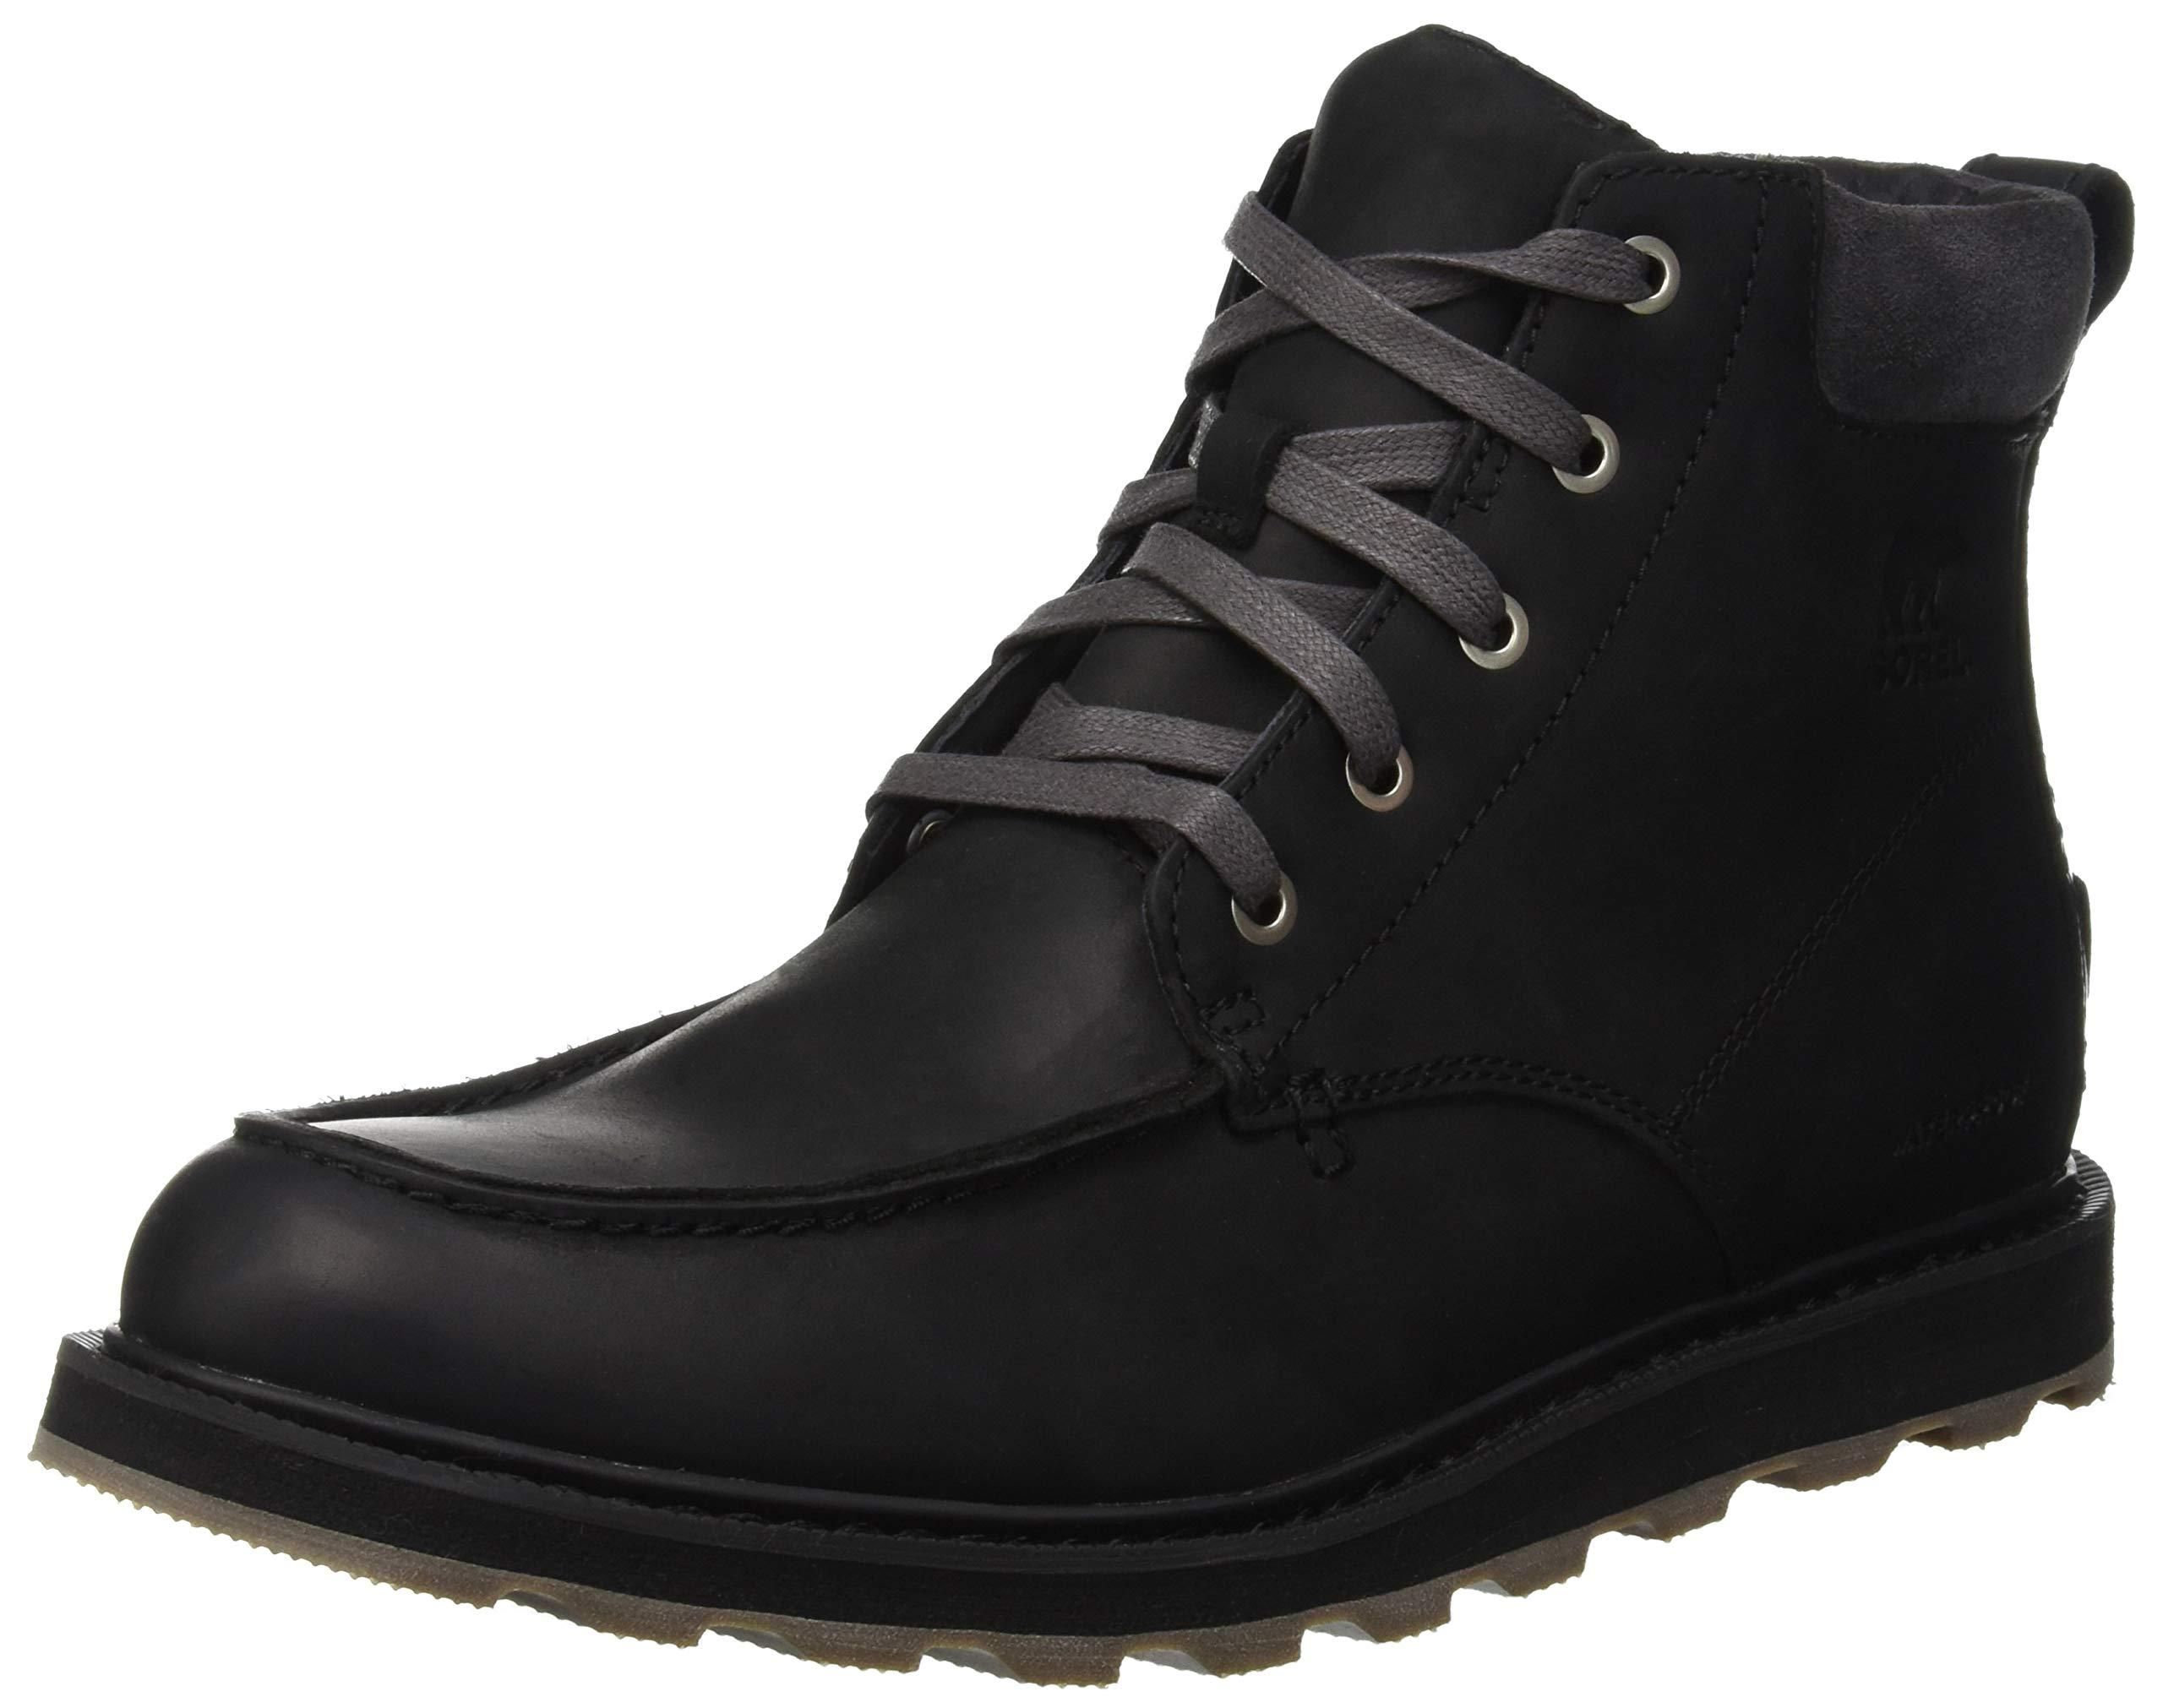 SOREL Madson Moc Toe Waterproof Boot - Men's Black/Dark Grey, 9.5